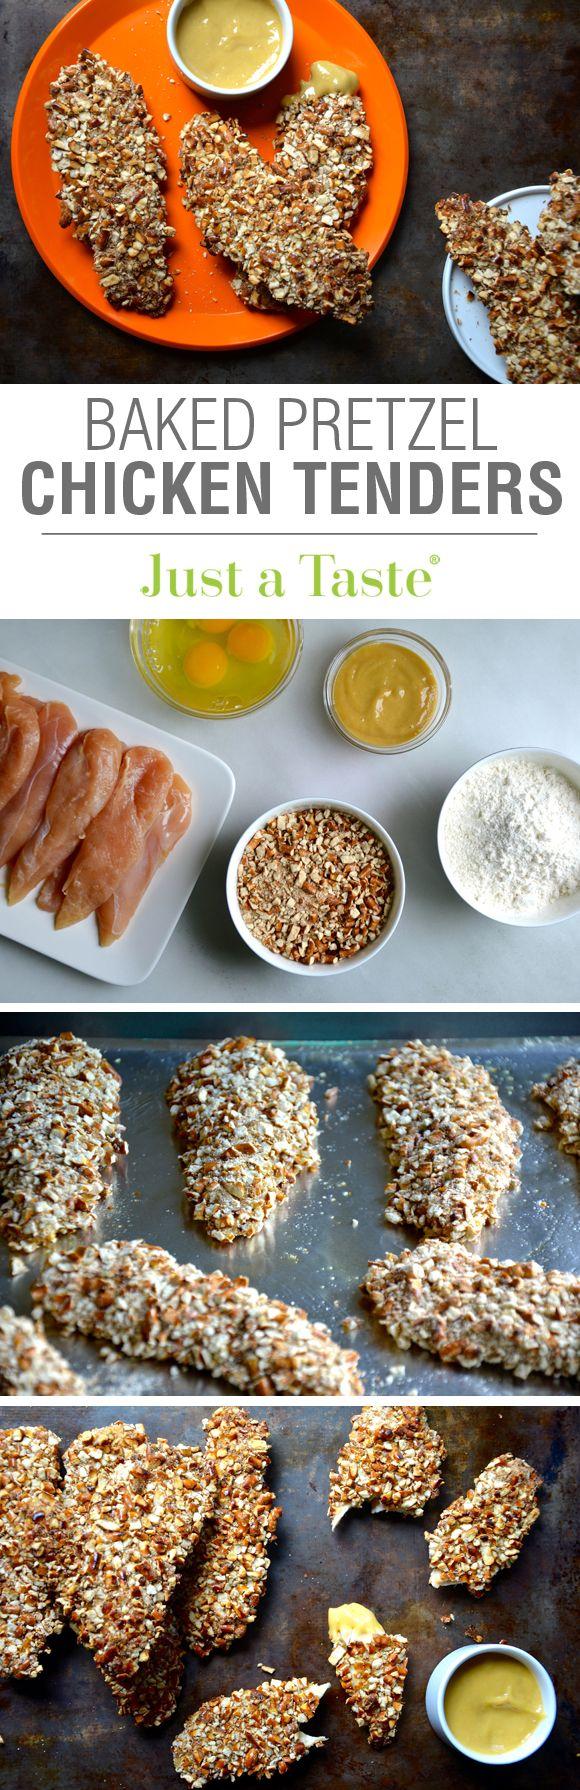 Baked Honey Mustard Pretzel Chicken Tenders recipe via justataste.com | A 30-minute dinner recipe for the whole family!